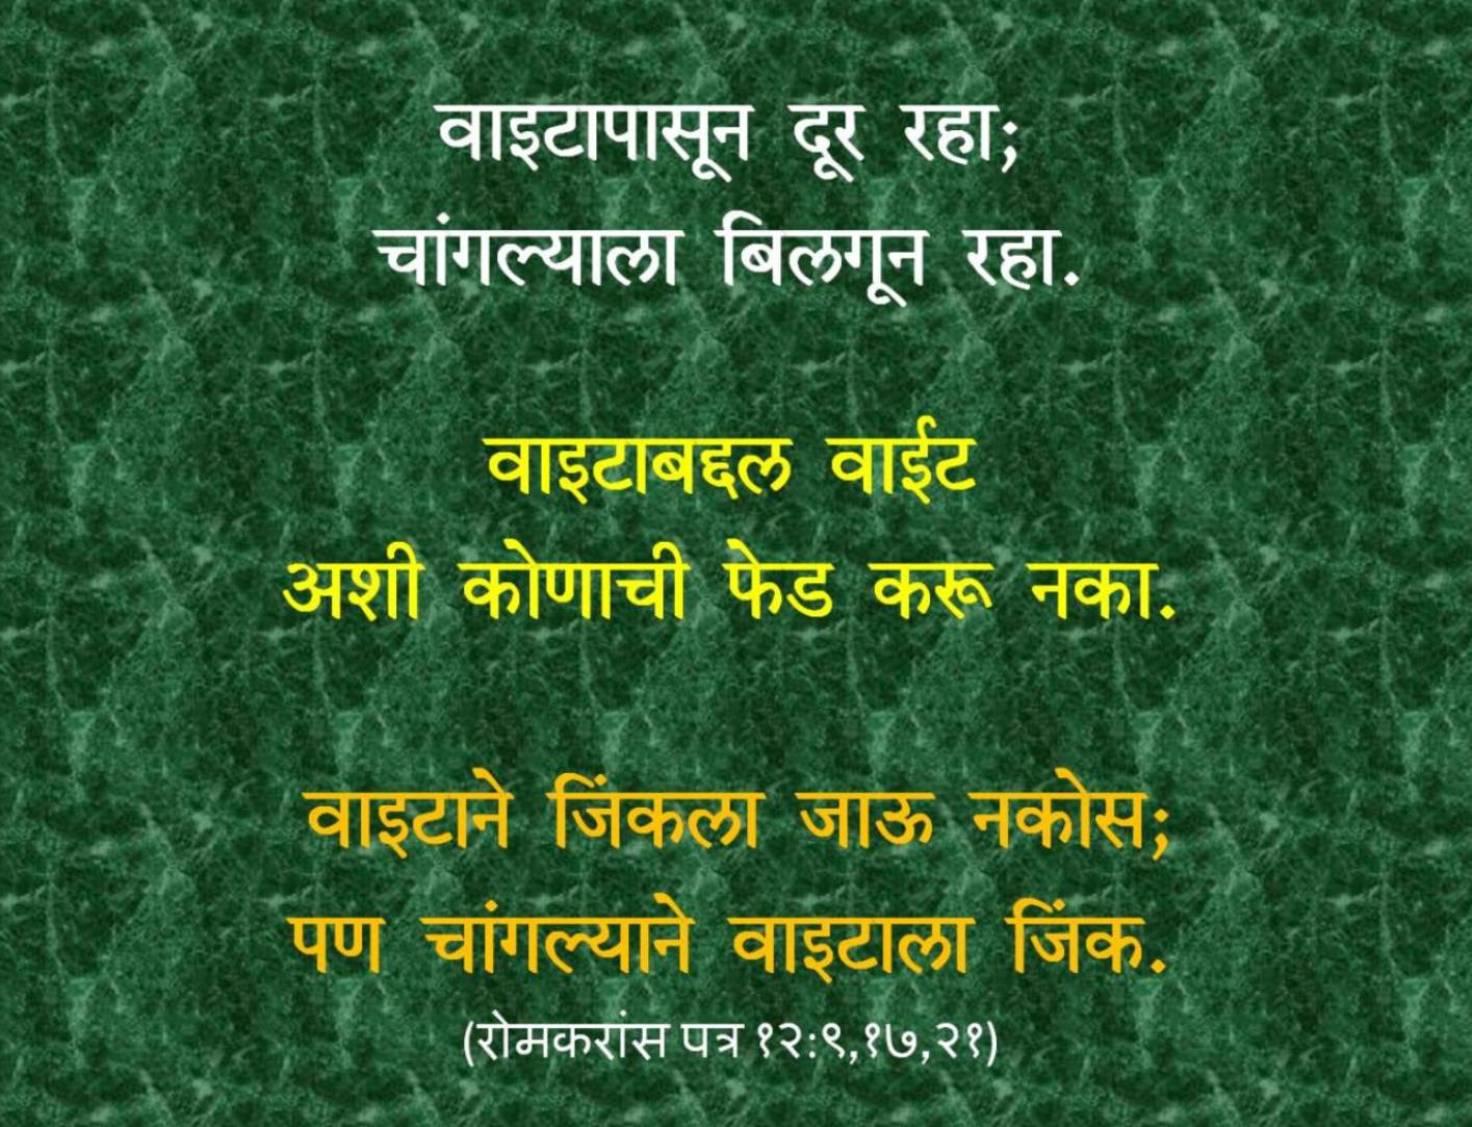 marathi bible wallpaper for - photo #6